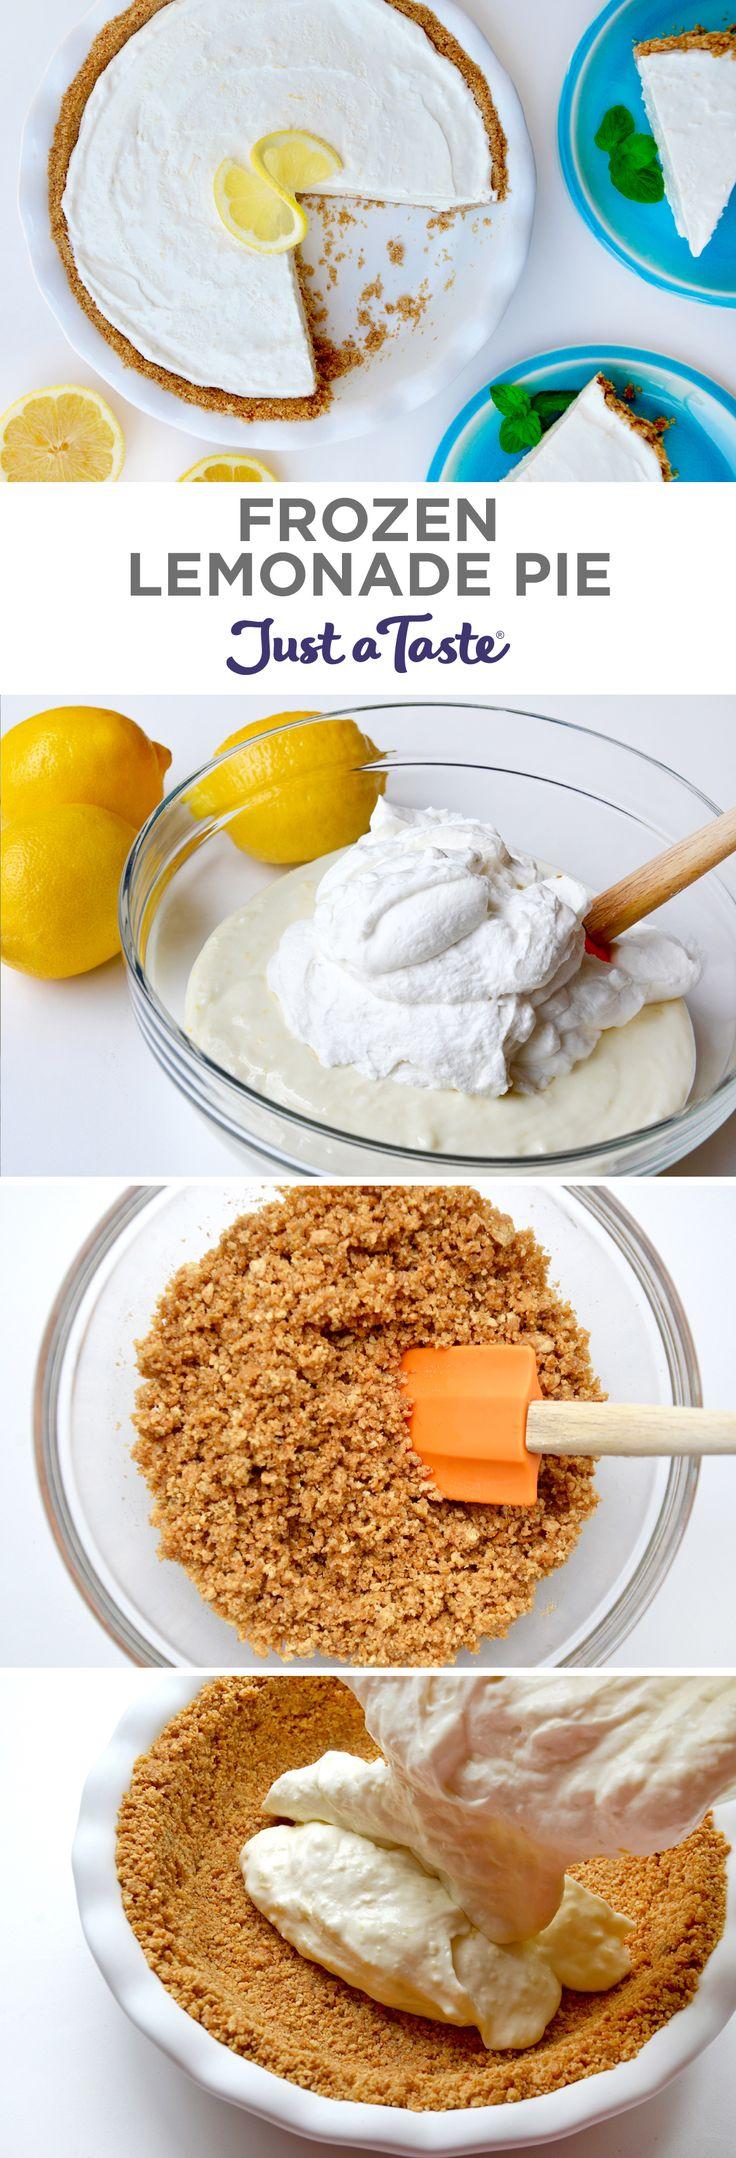 Frozen Lemonade Pie   recipe via justataste.com